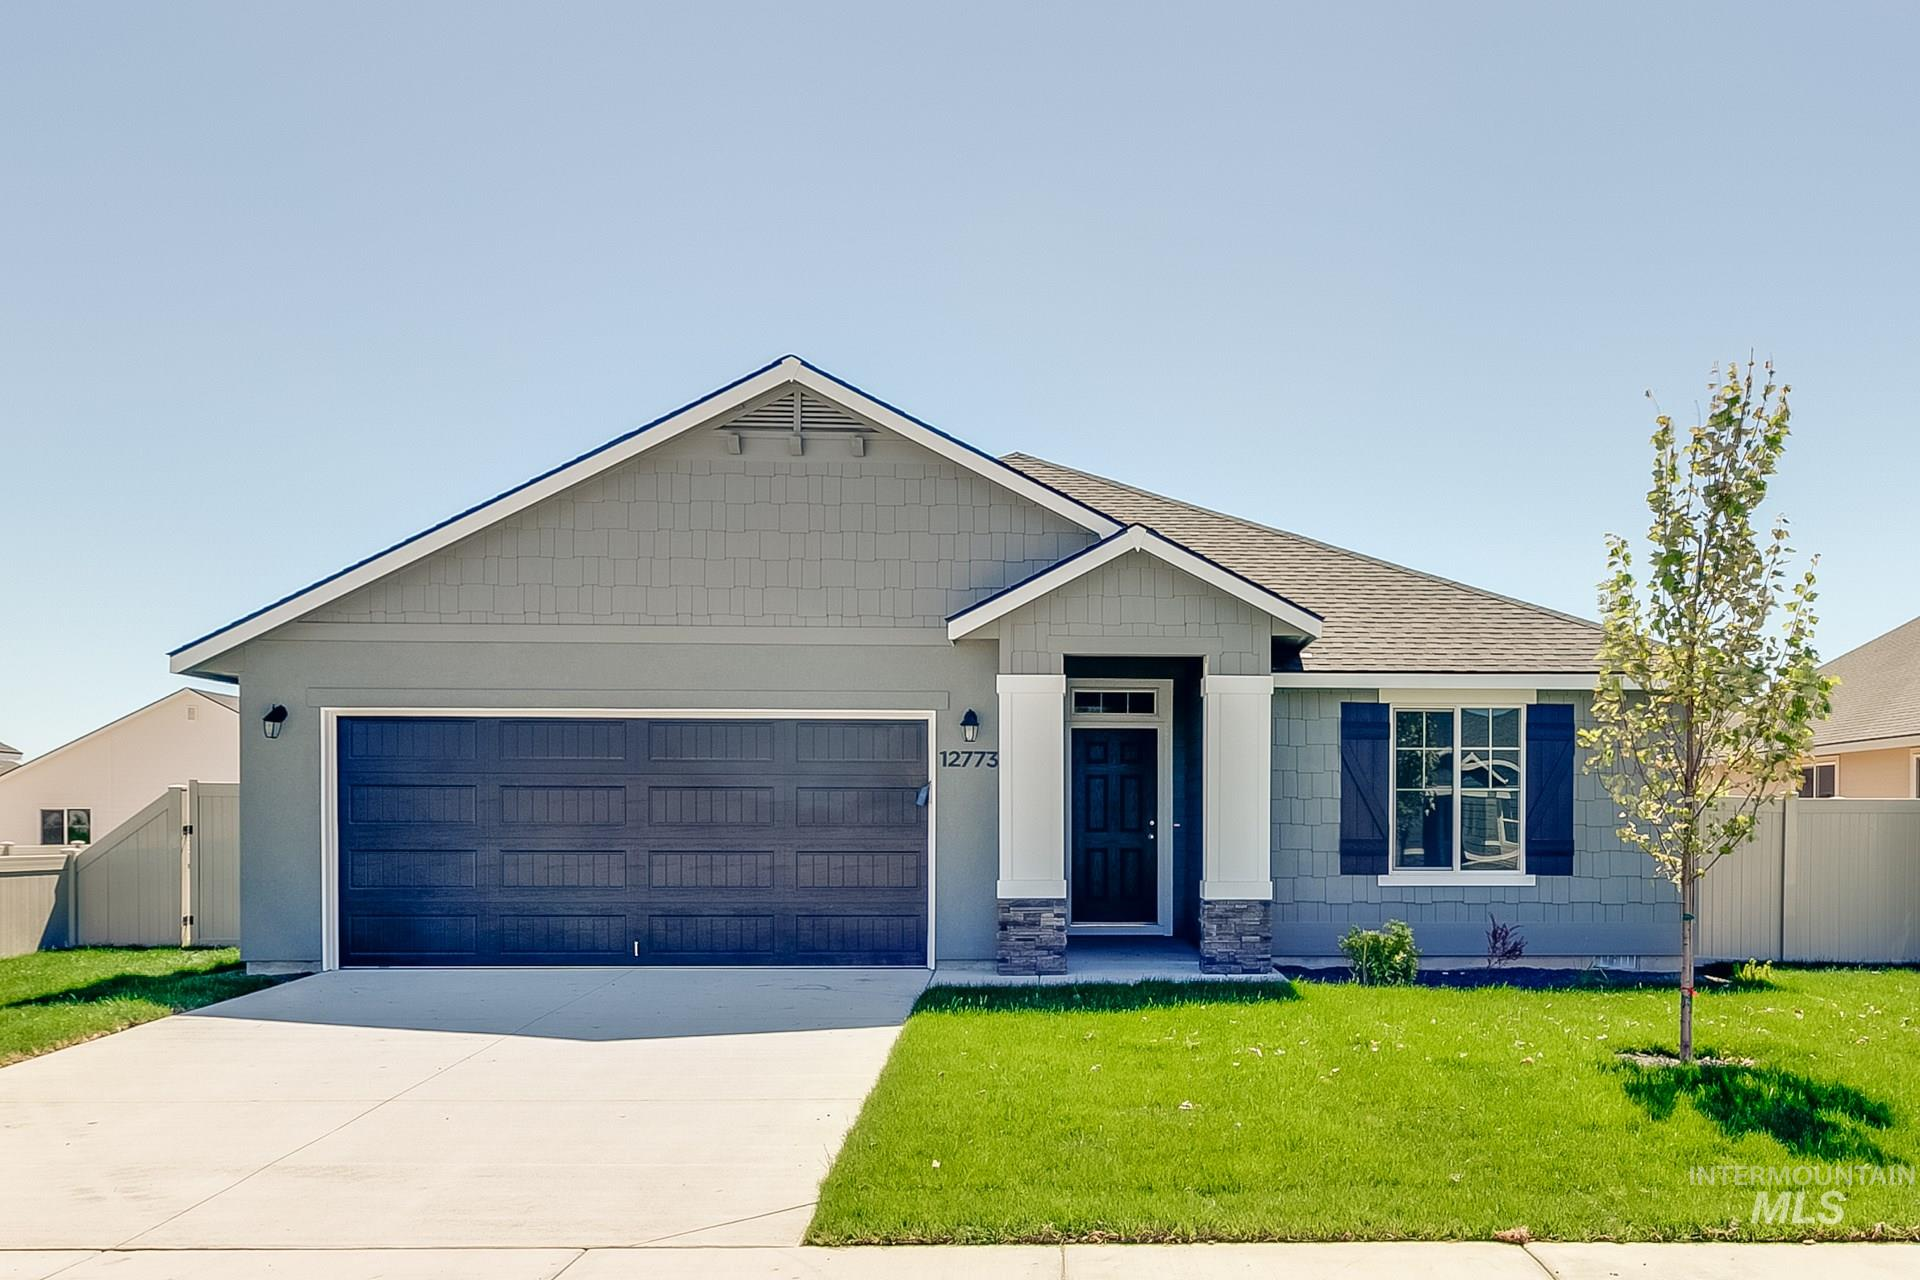 2502 W Balboa Dr Property Photo - Kuna, ID real estate listing